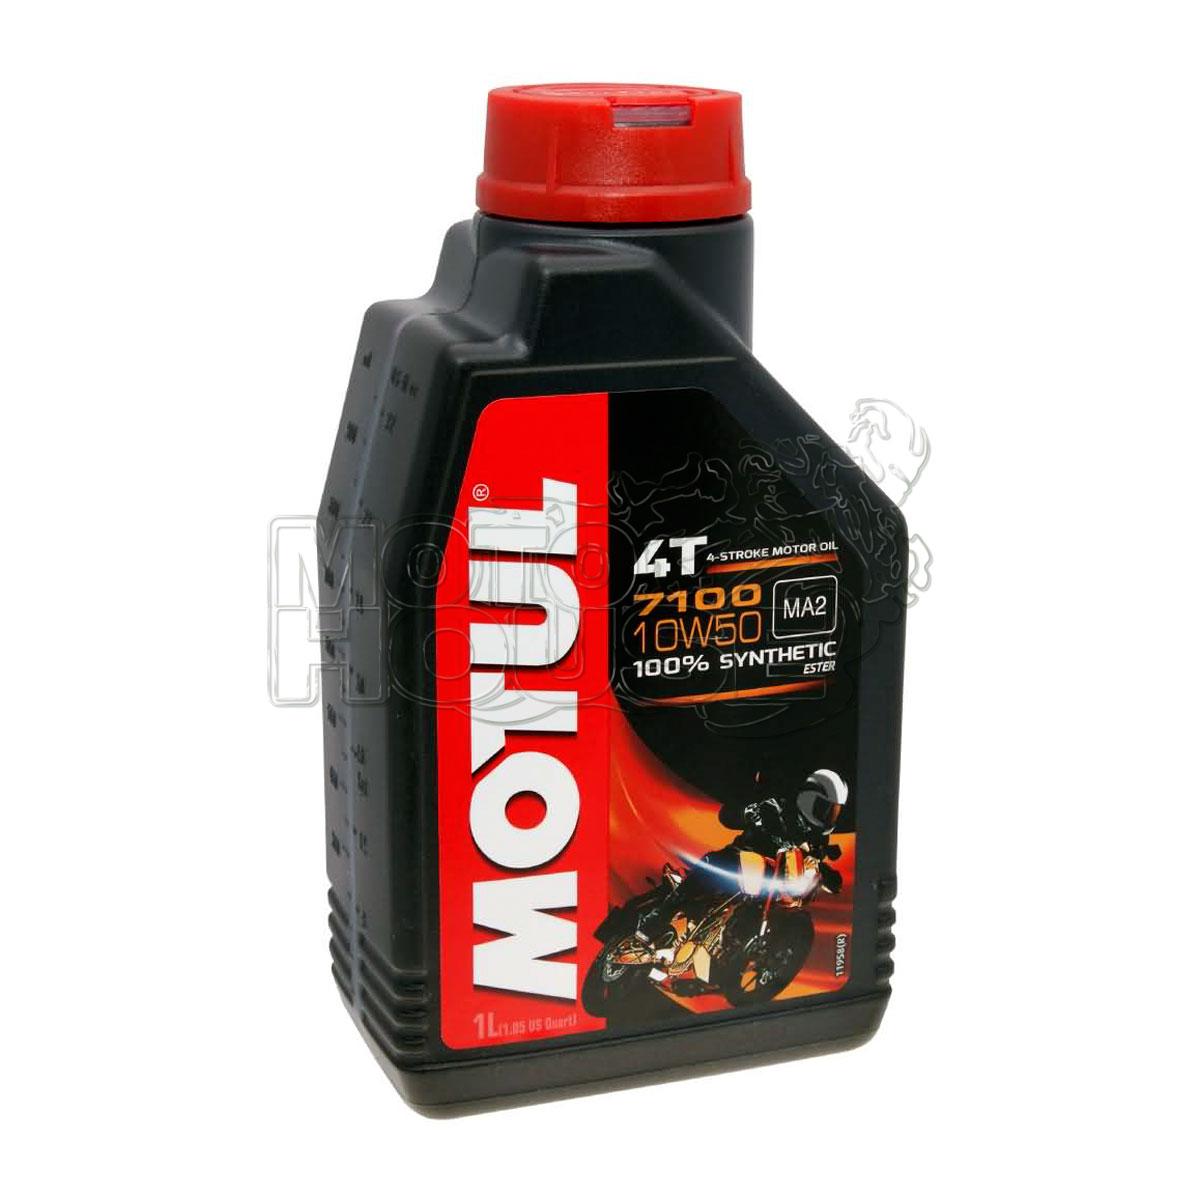 Aceite Para Motocicleta Motul 4t 7100 10w50 1 Lt